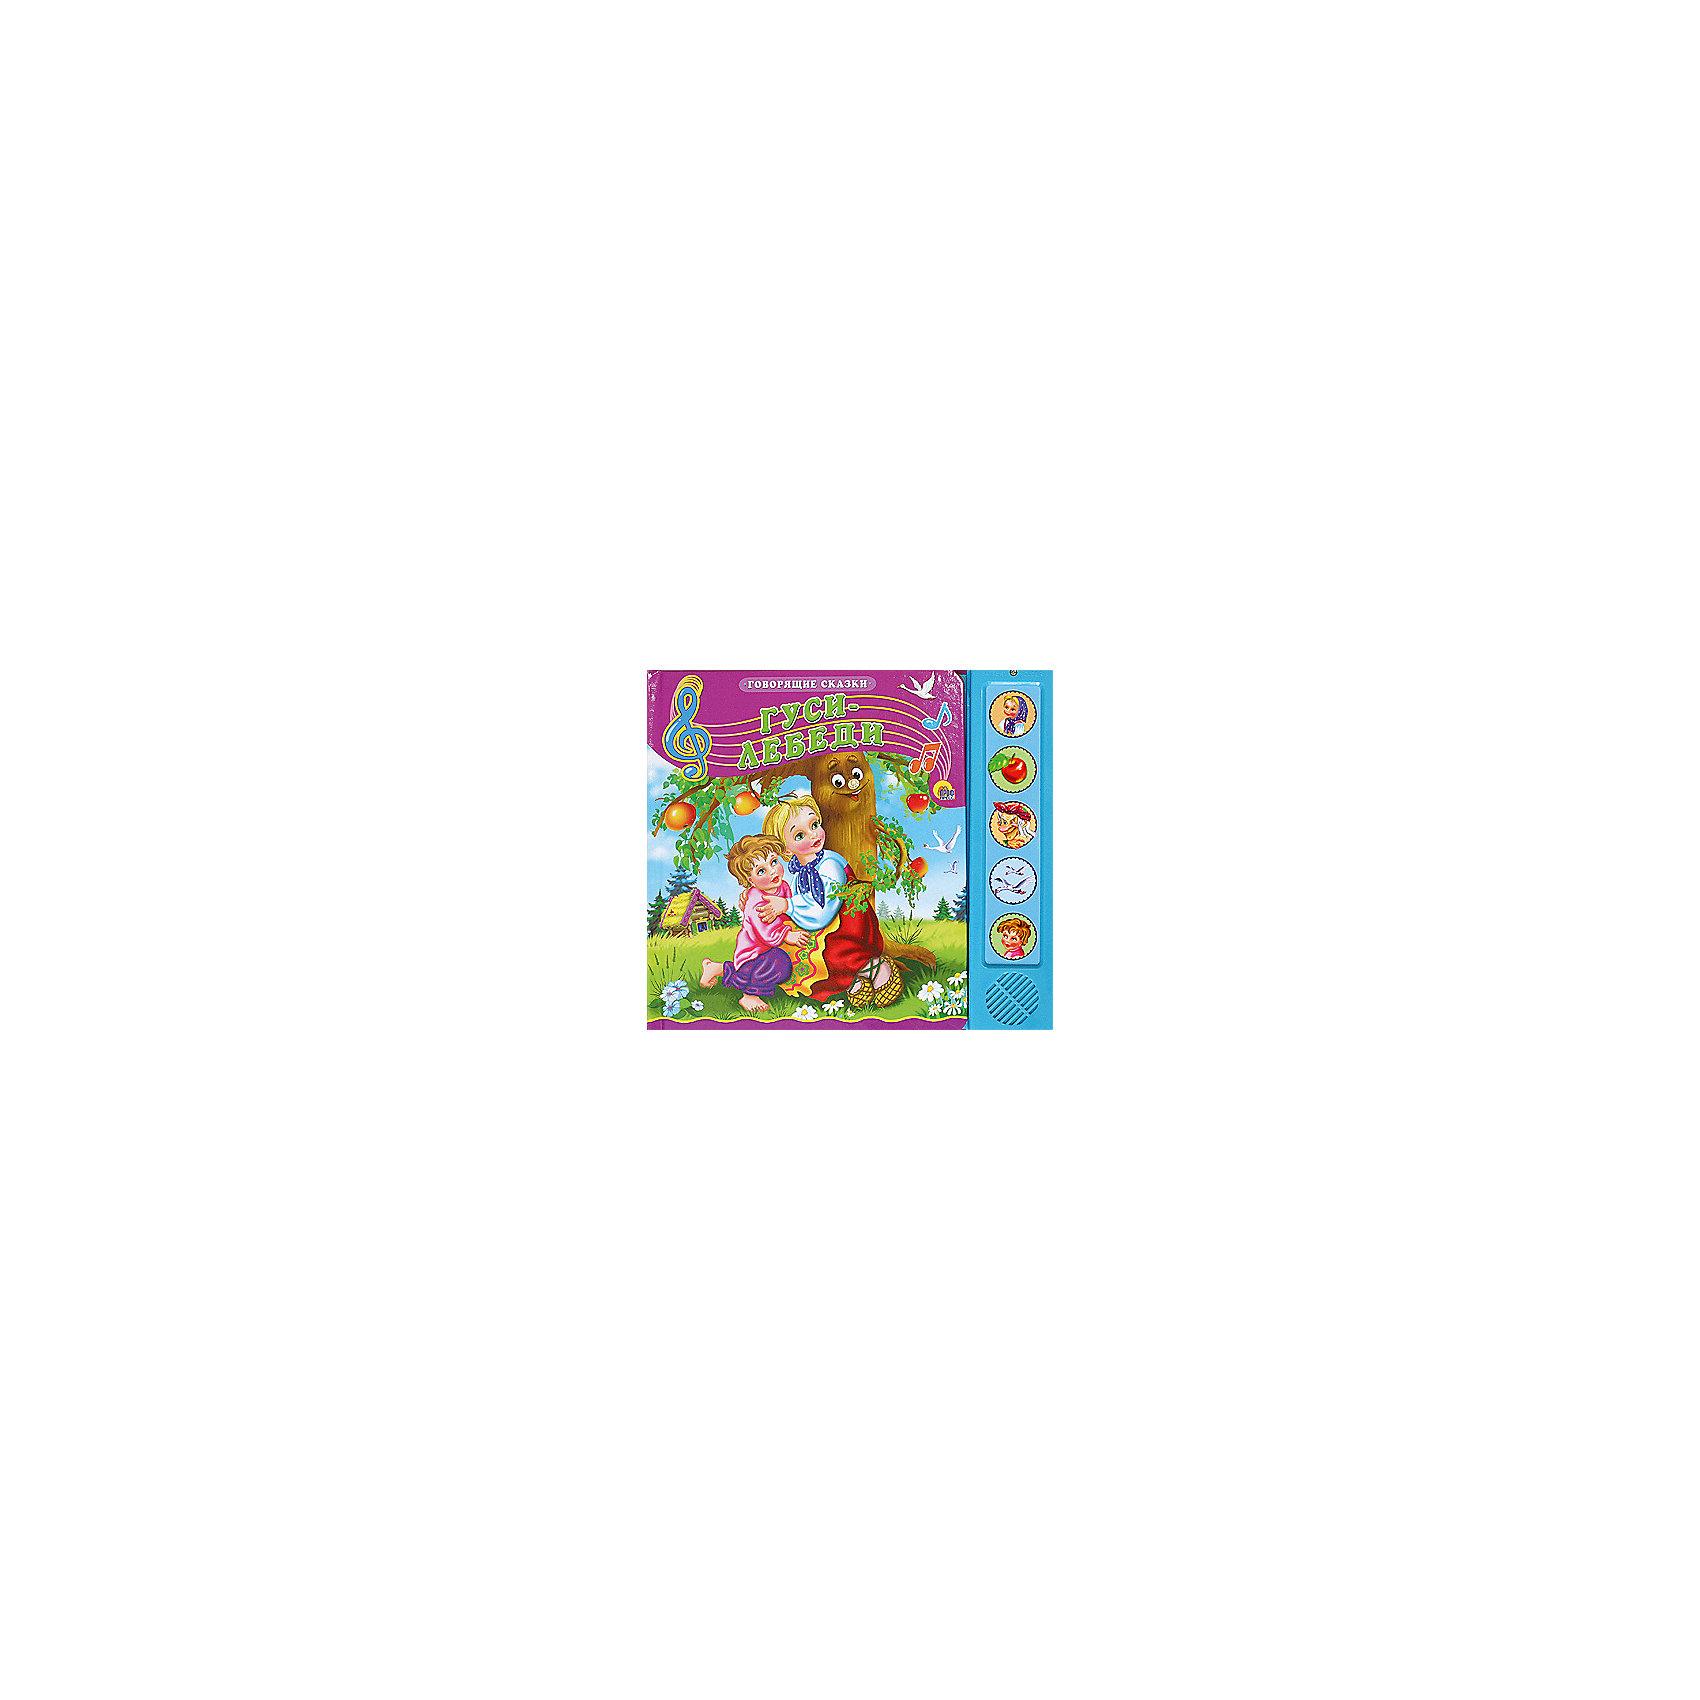 Проф-Пресс Говорящие сказки. Гуси-лебеди музыкальные книжки проф пресс говорящие сказки золушка